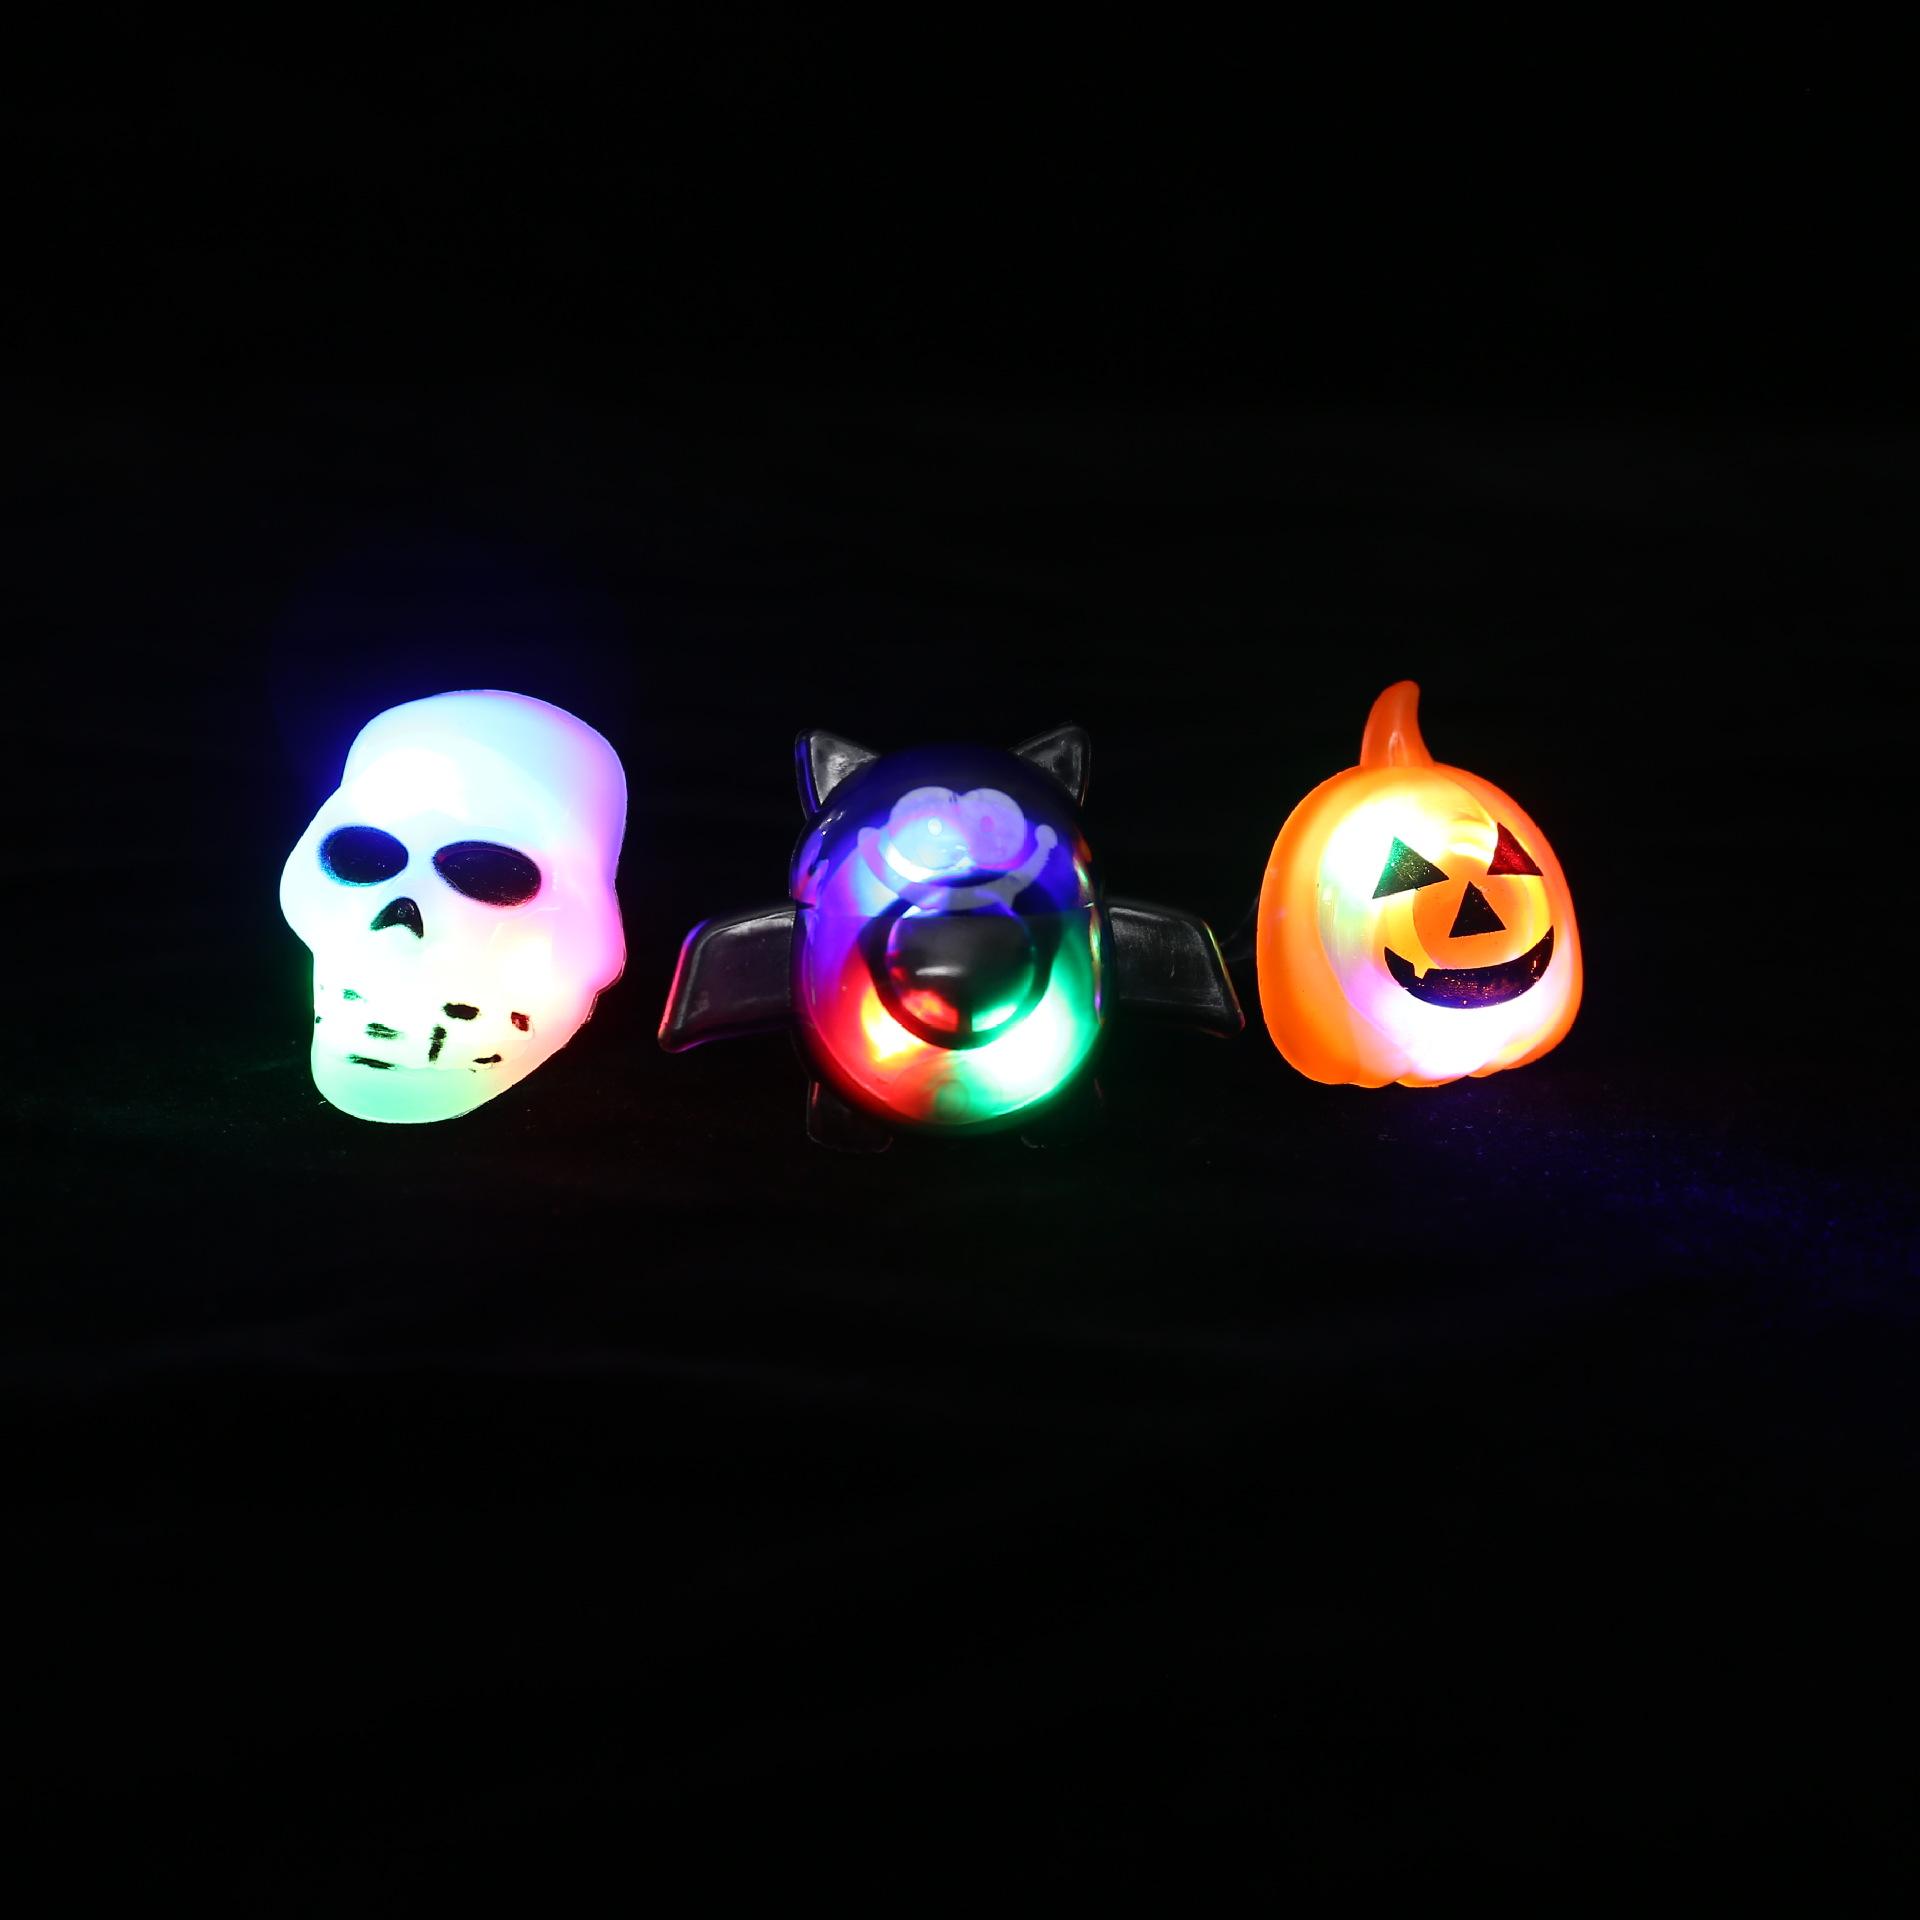 Halloween Plastic Ring LED Glowing Pumpkin Lantern Ring Bat Skull Ring Tricky Small Gift 6